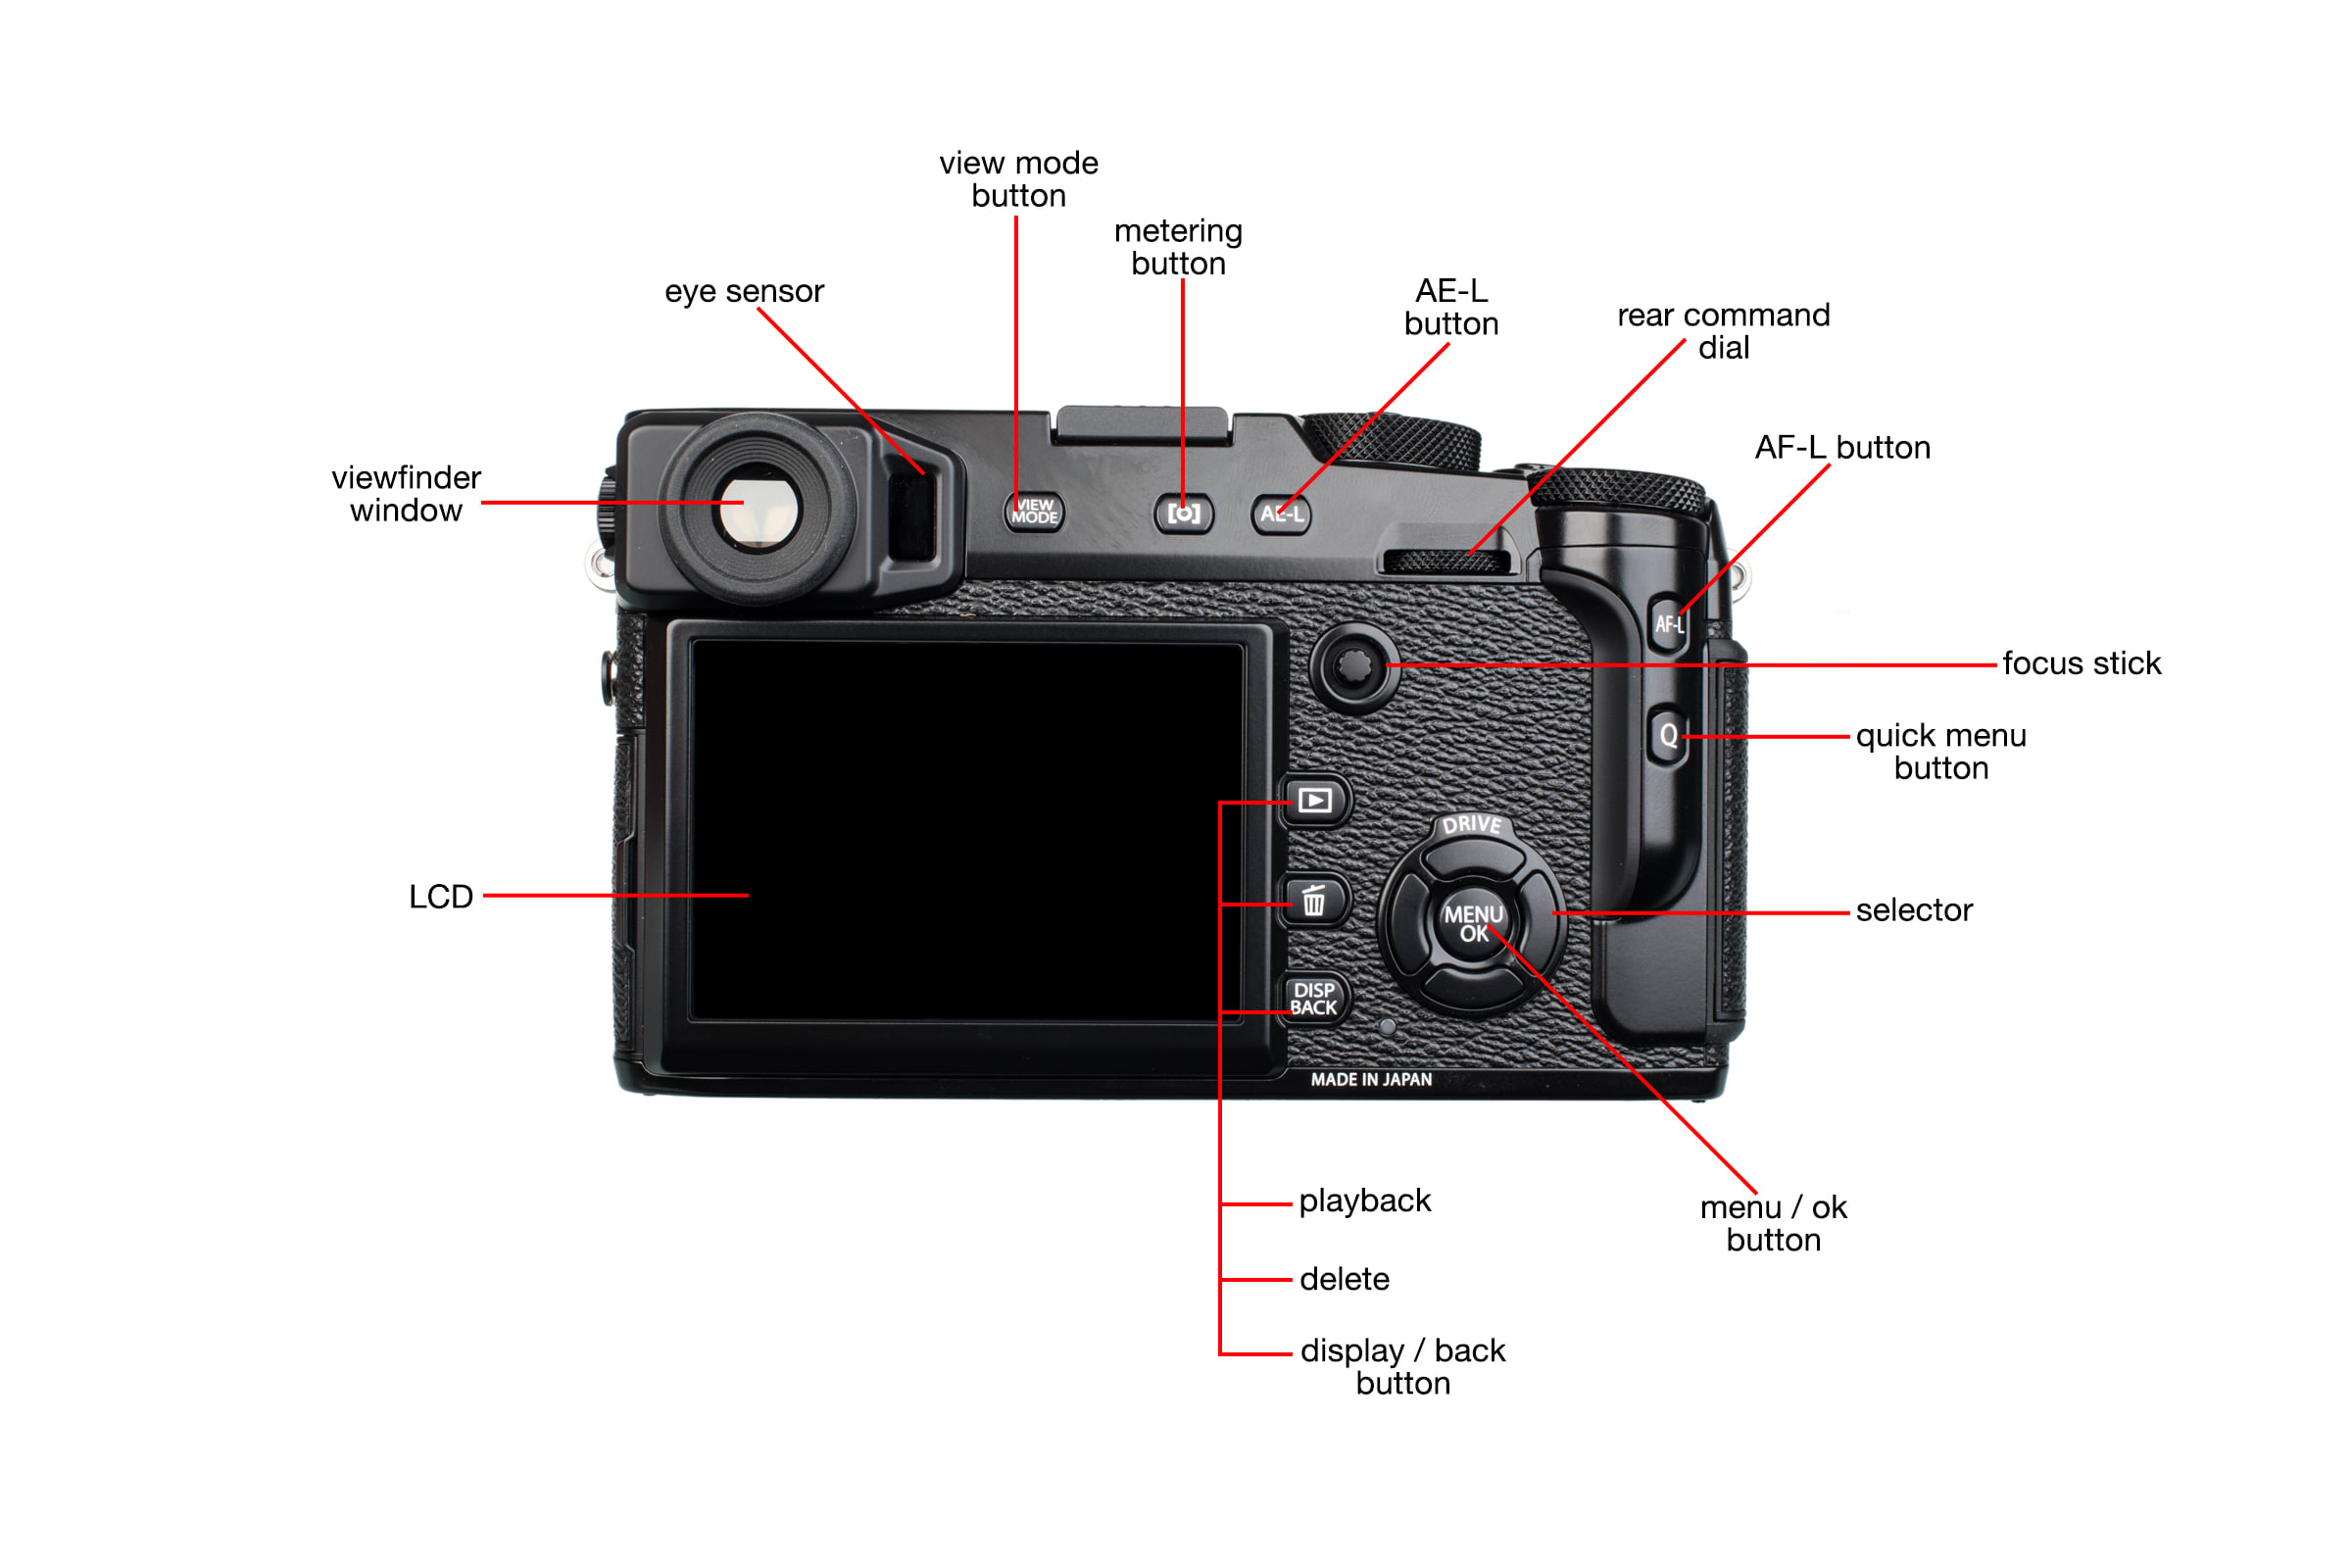 Rear view of the Fujifilm X-Pro2.